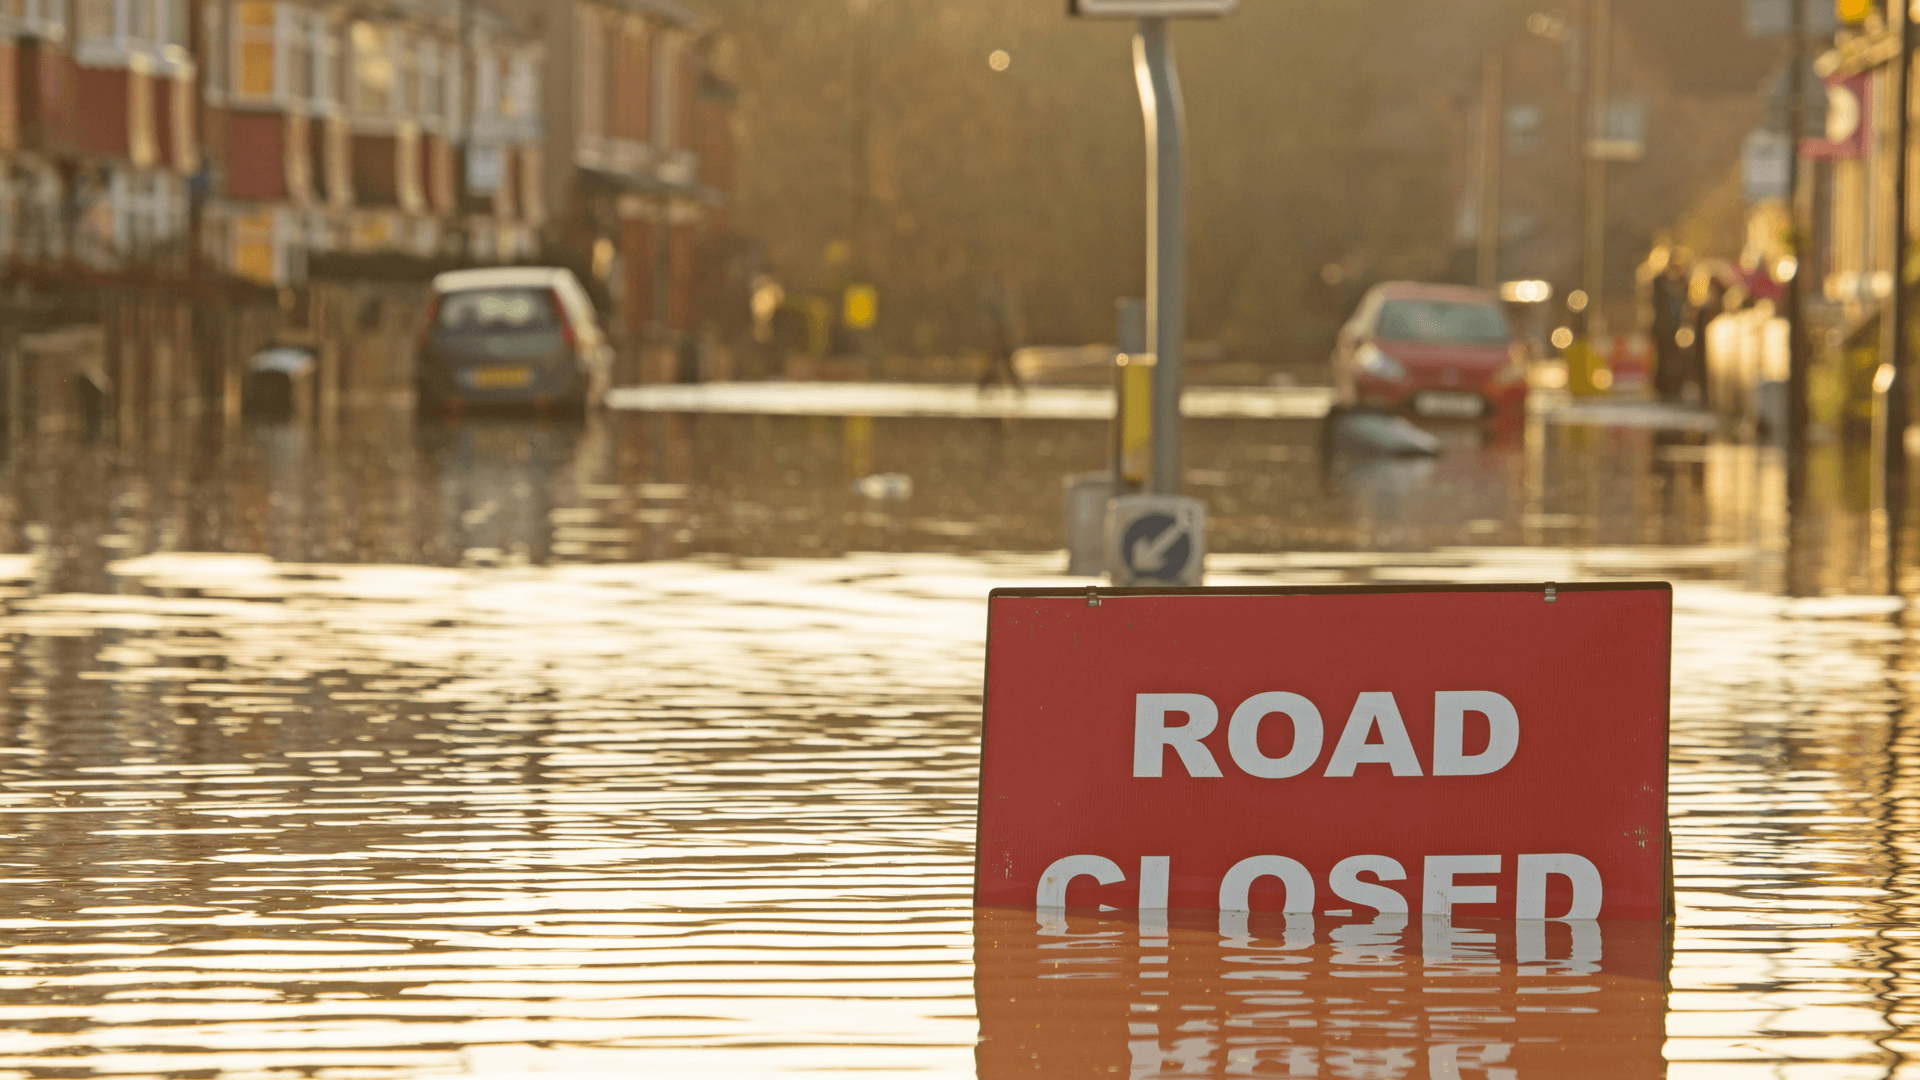 092617-Blog-Flood Emergency Preparedness and Citizen Communications (1).png